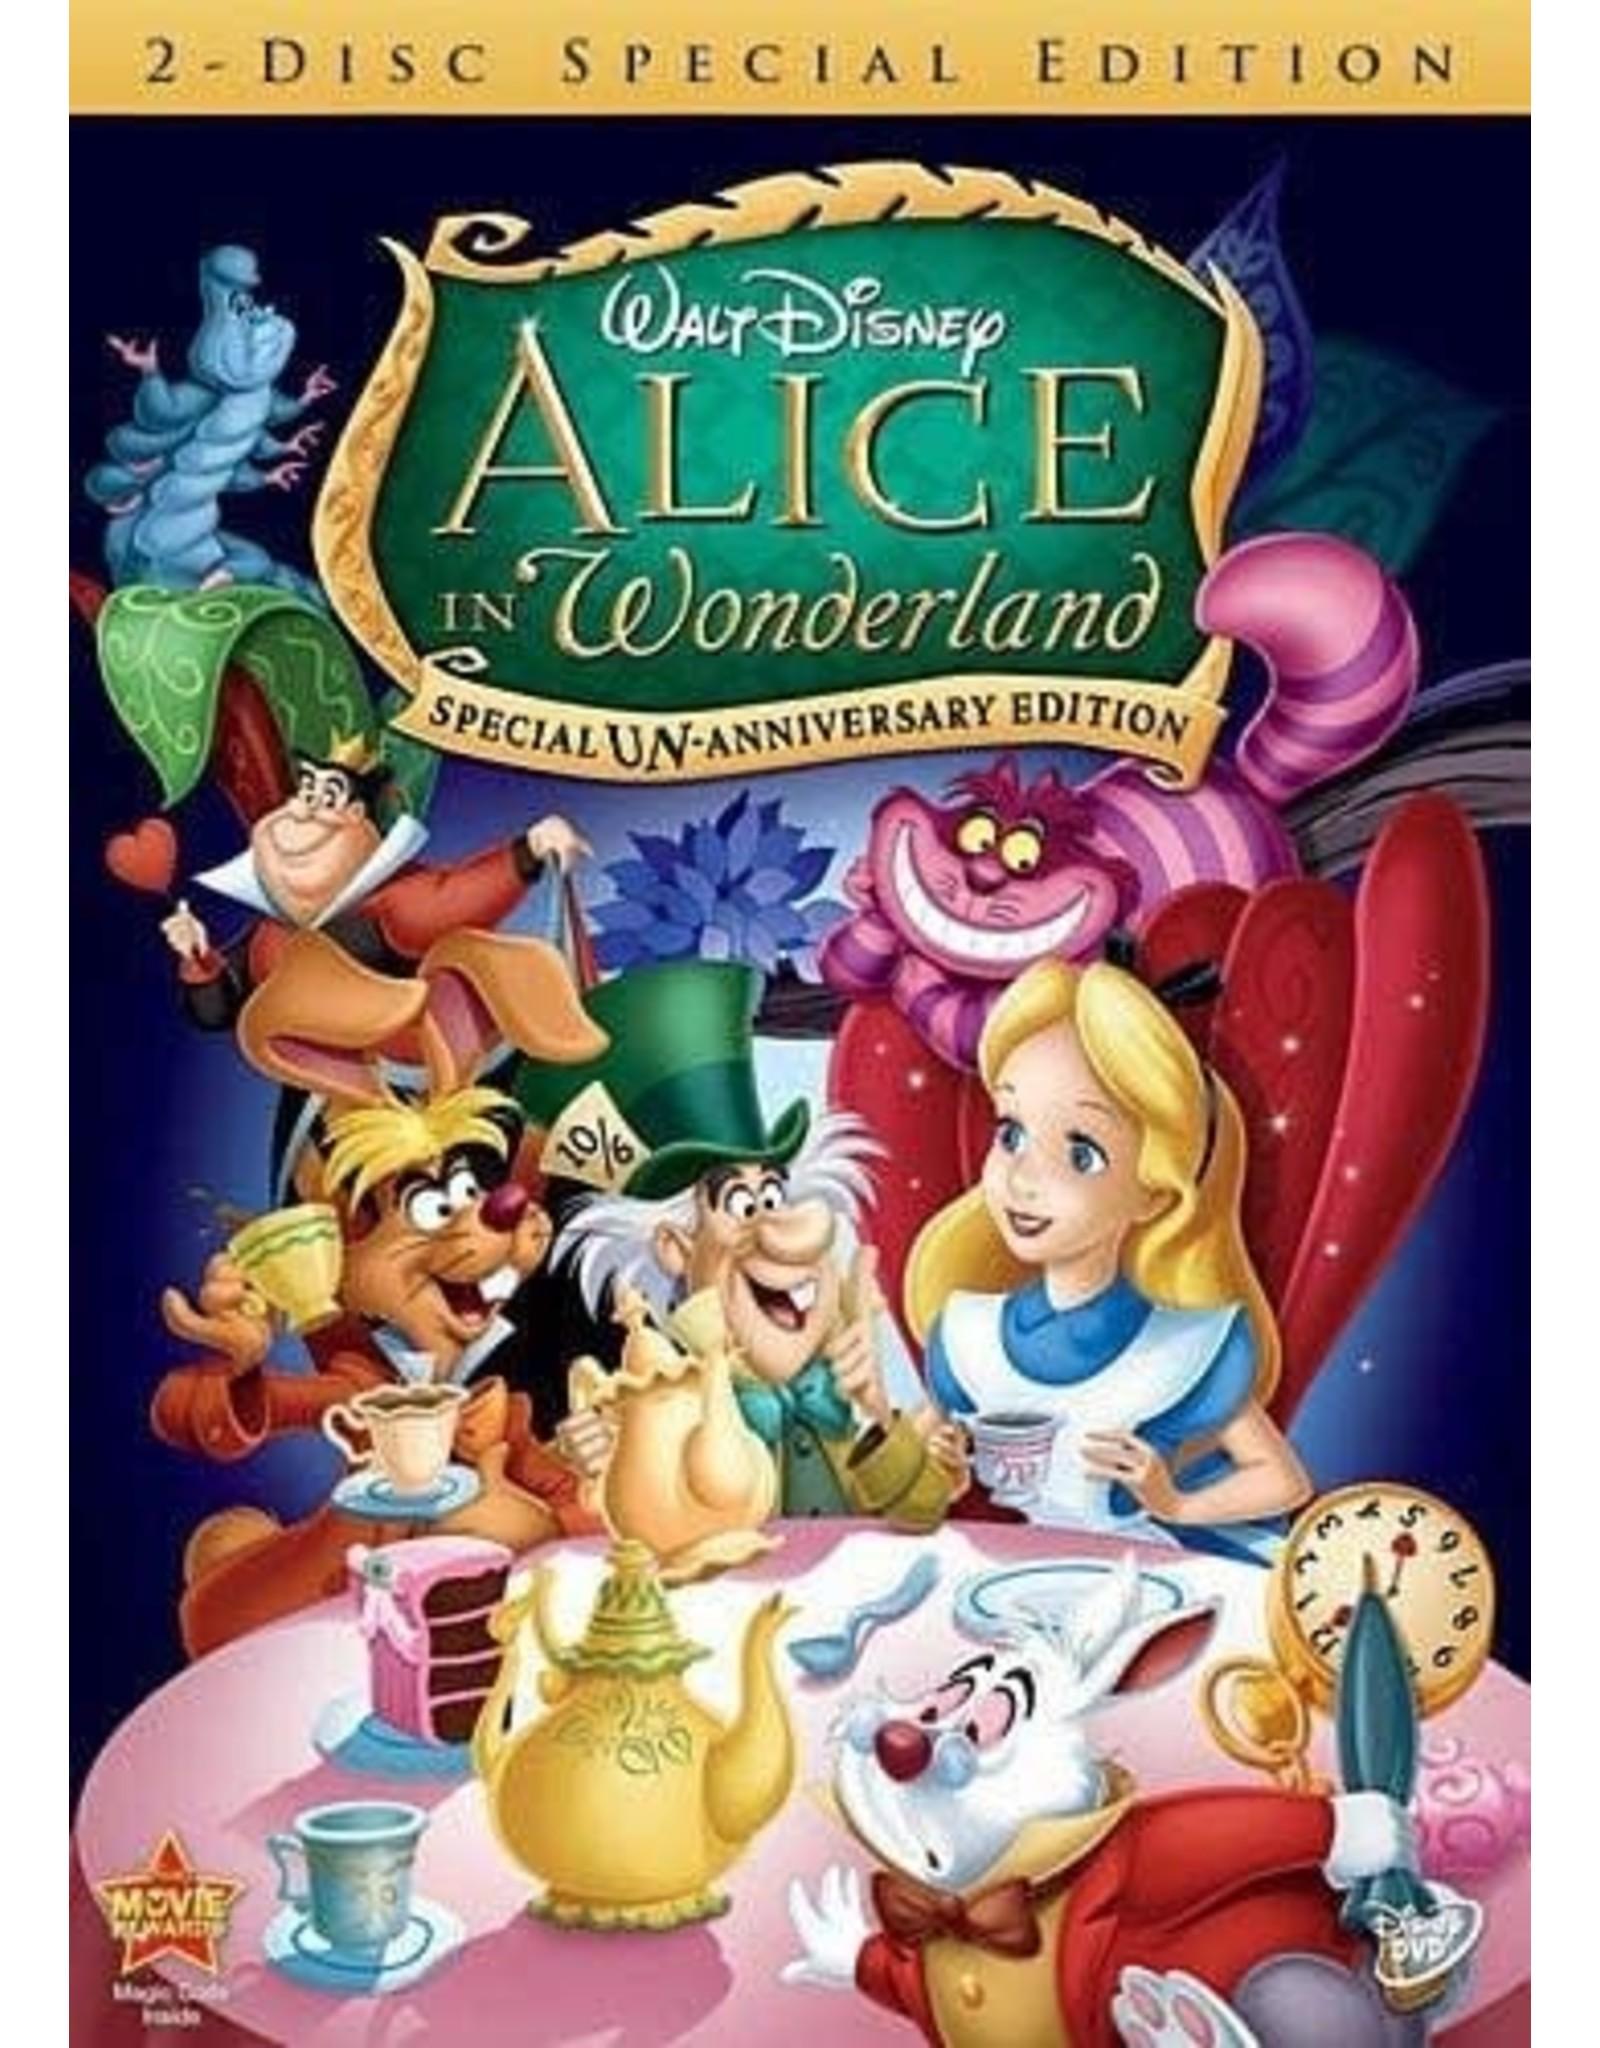 Disney Alice in Wonderland Special UN-Anniversary Edition (USED)